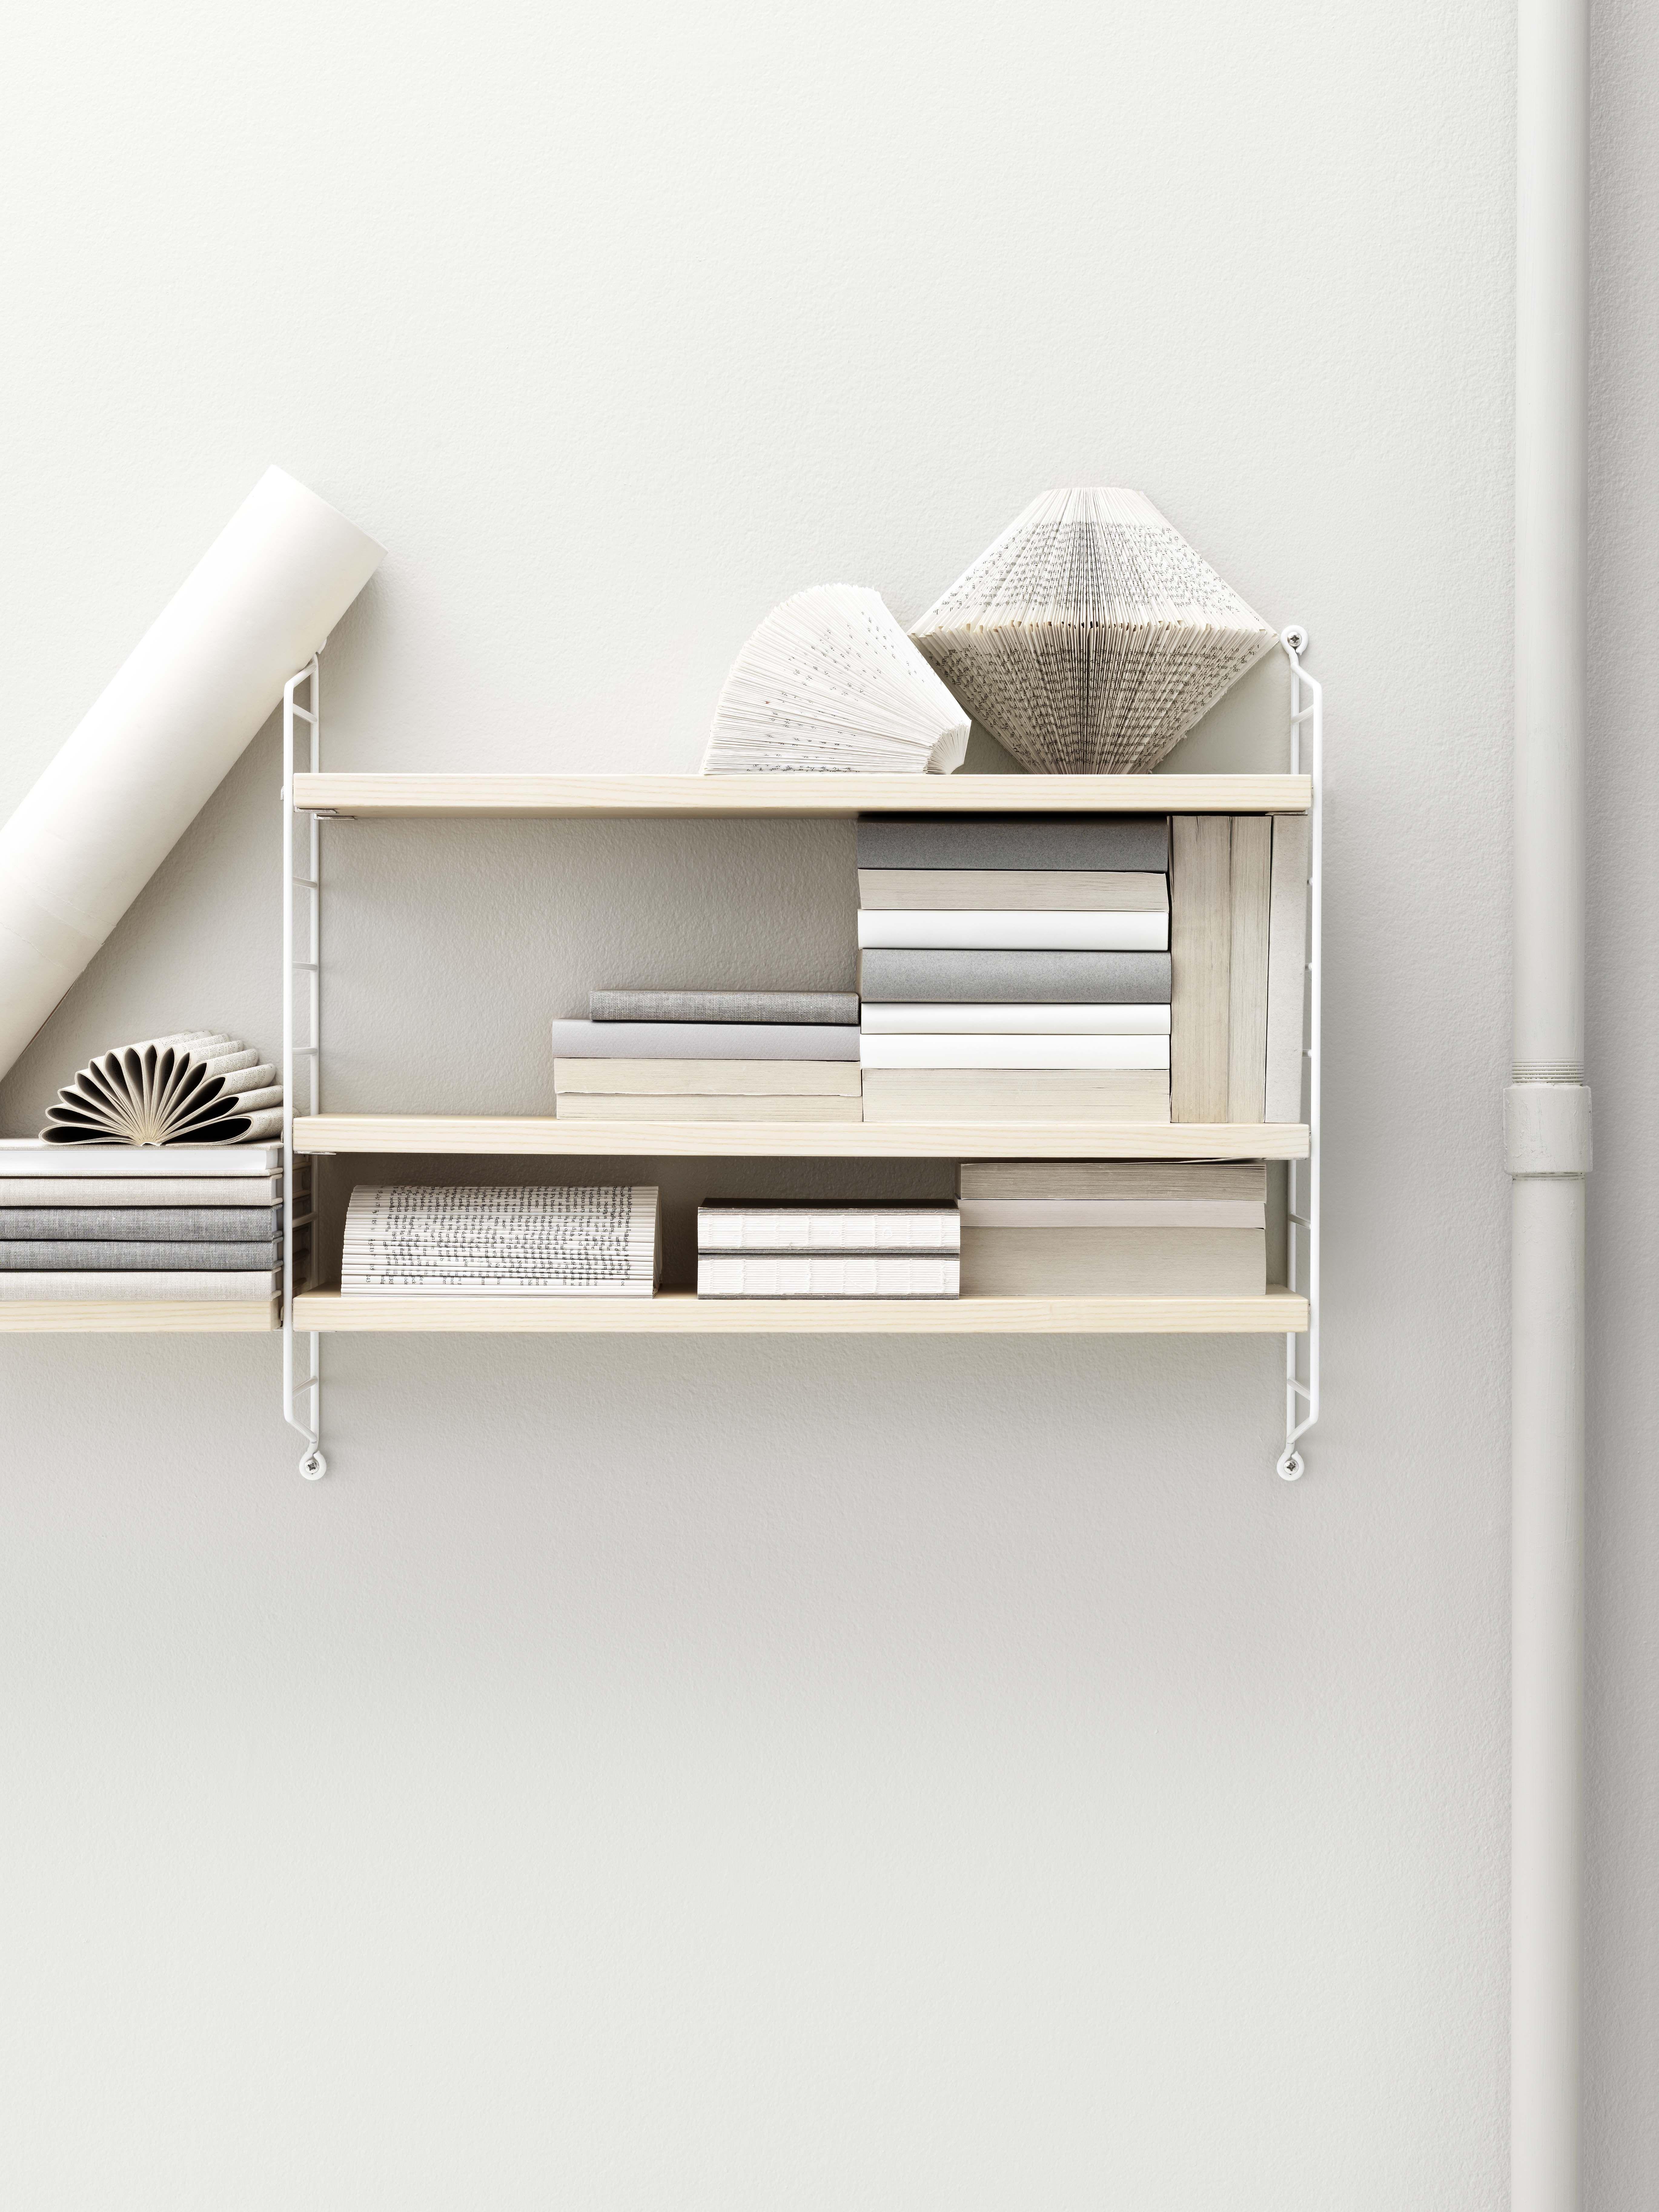 ... Möbel   Regale Und Bücherregale   String Pocket Regal / Holz   L 60 X H